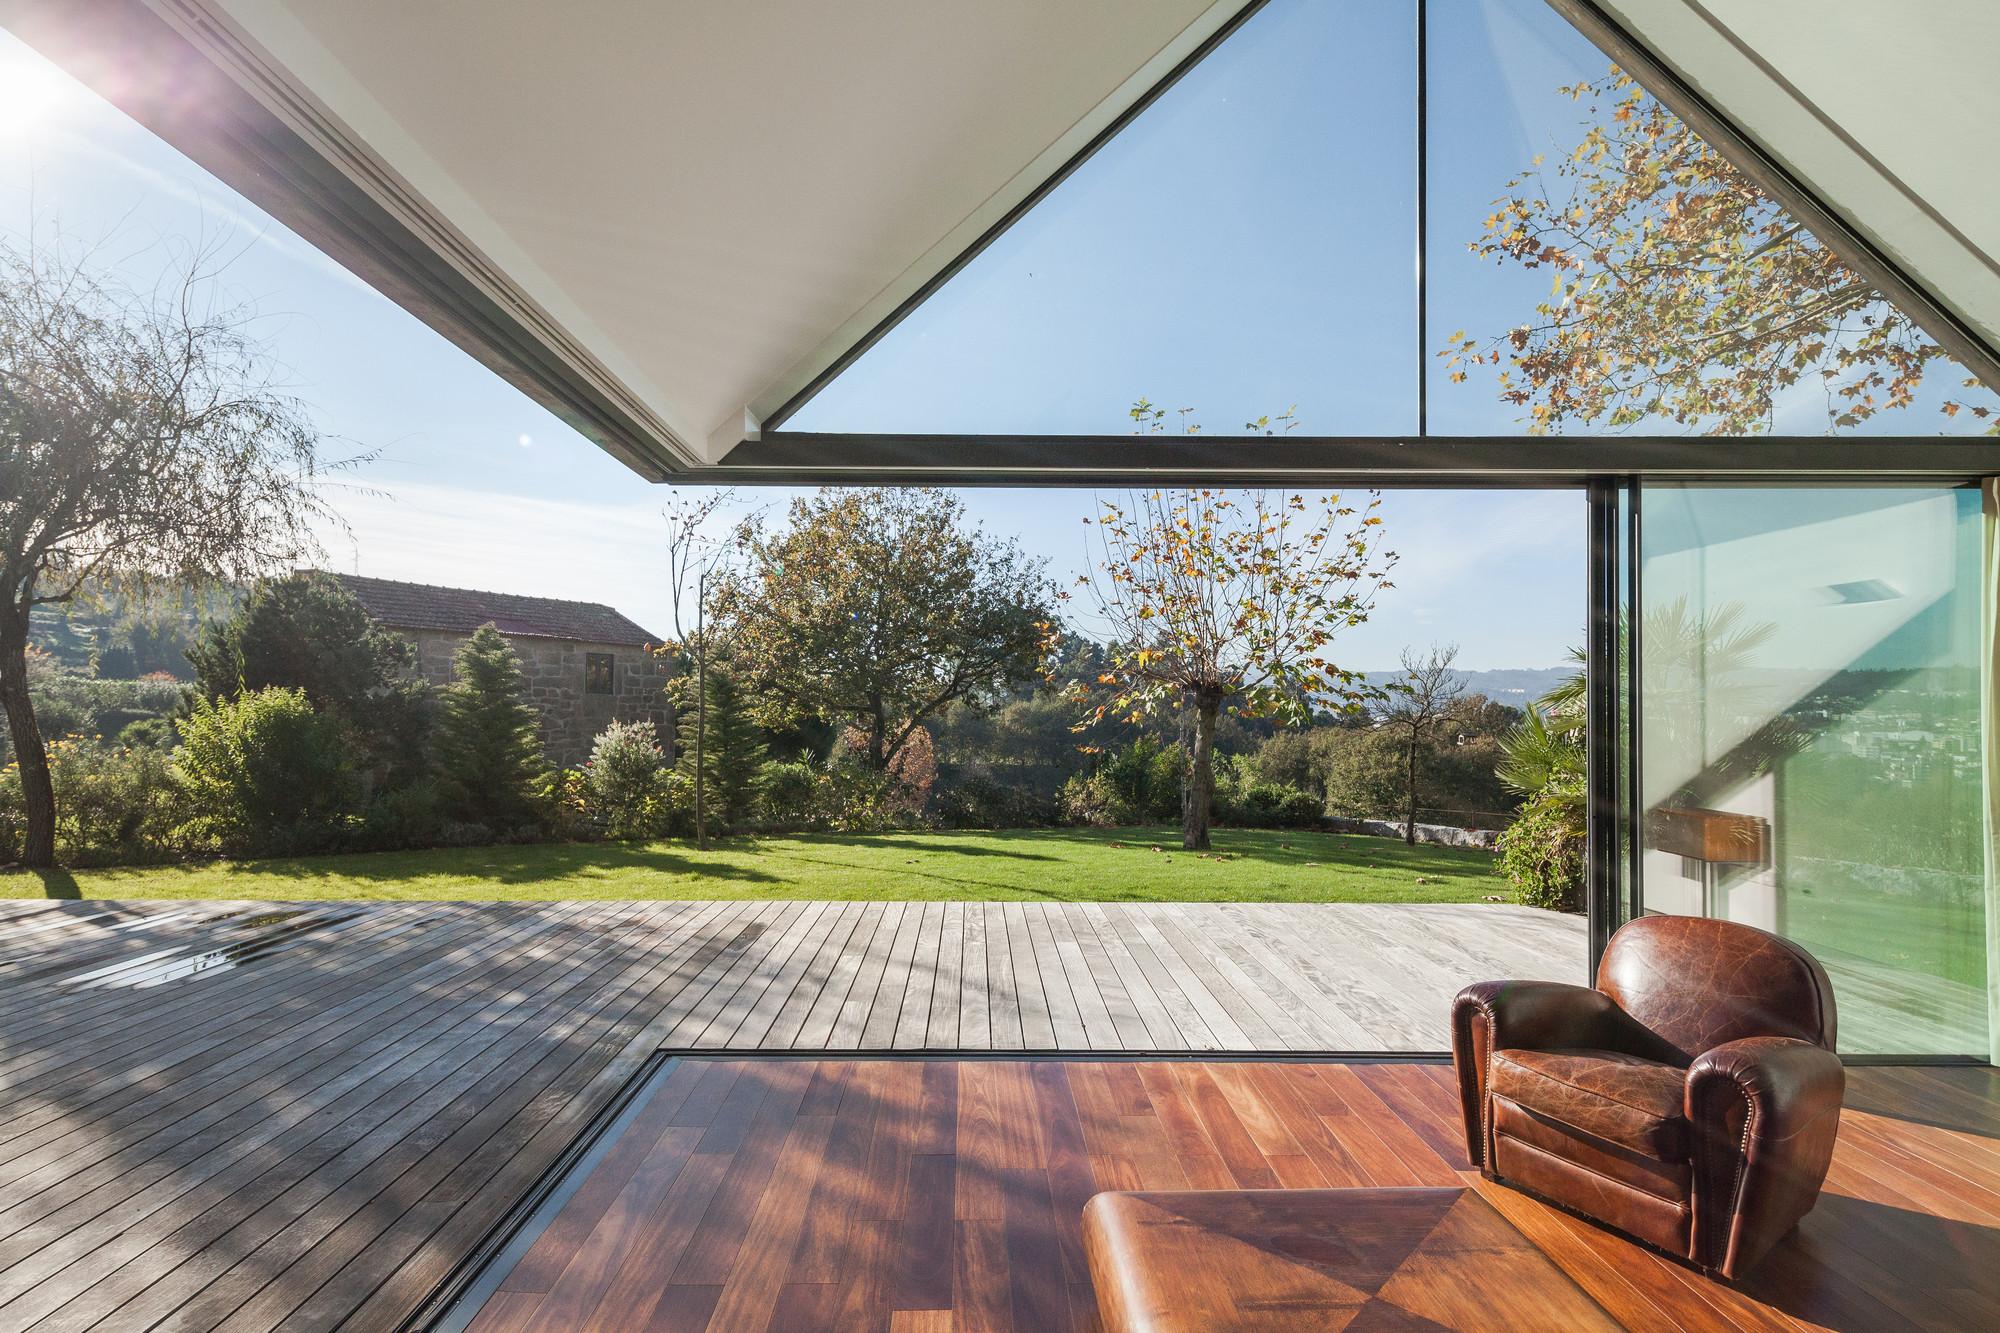 House of Four Houses / PROD architecture & design, © Joao Morgado